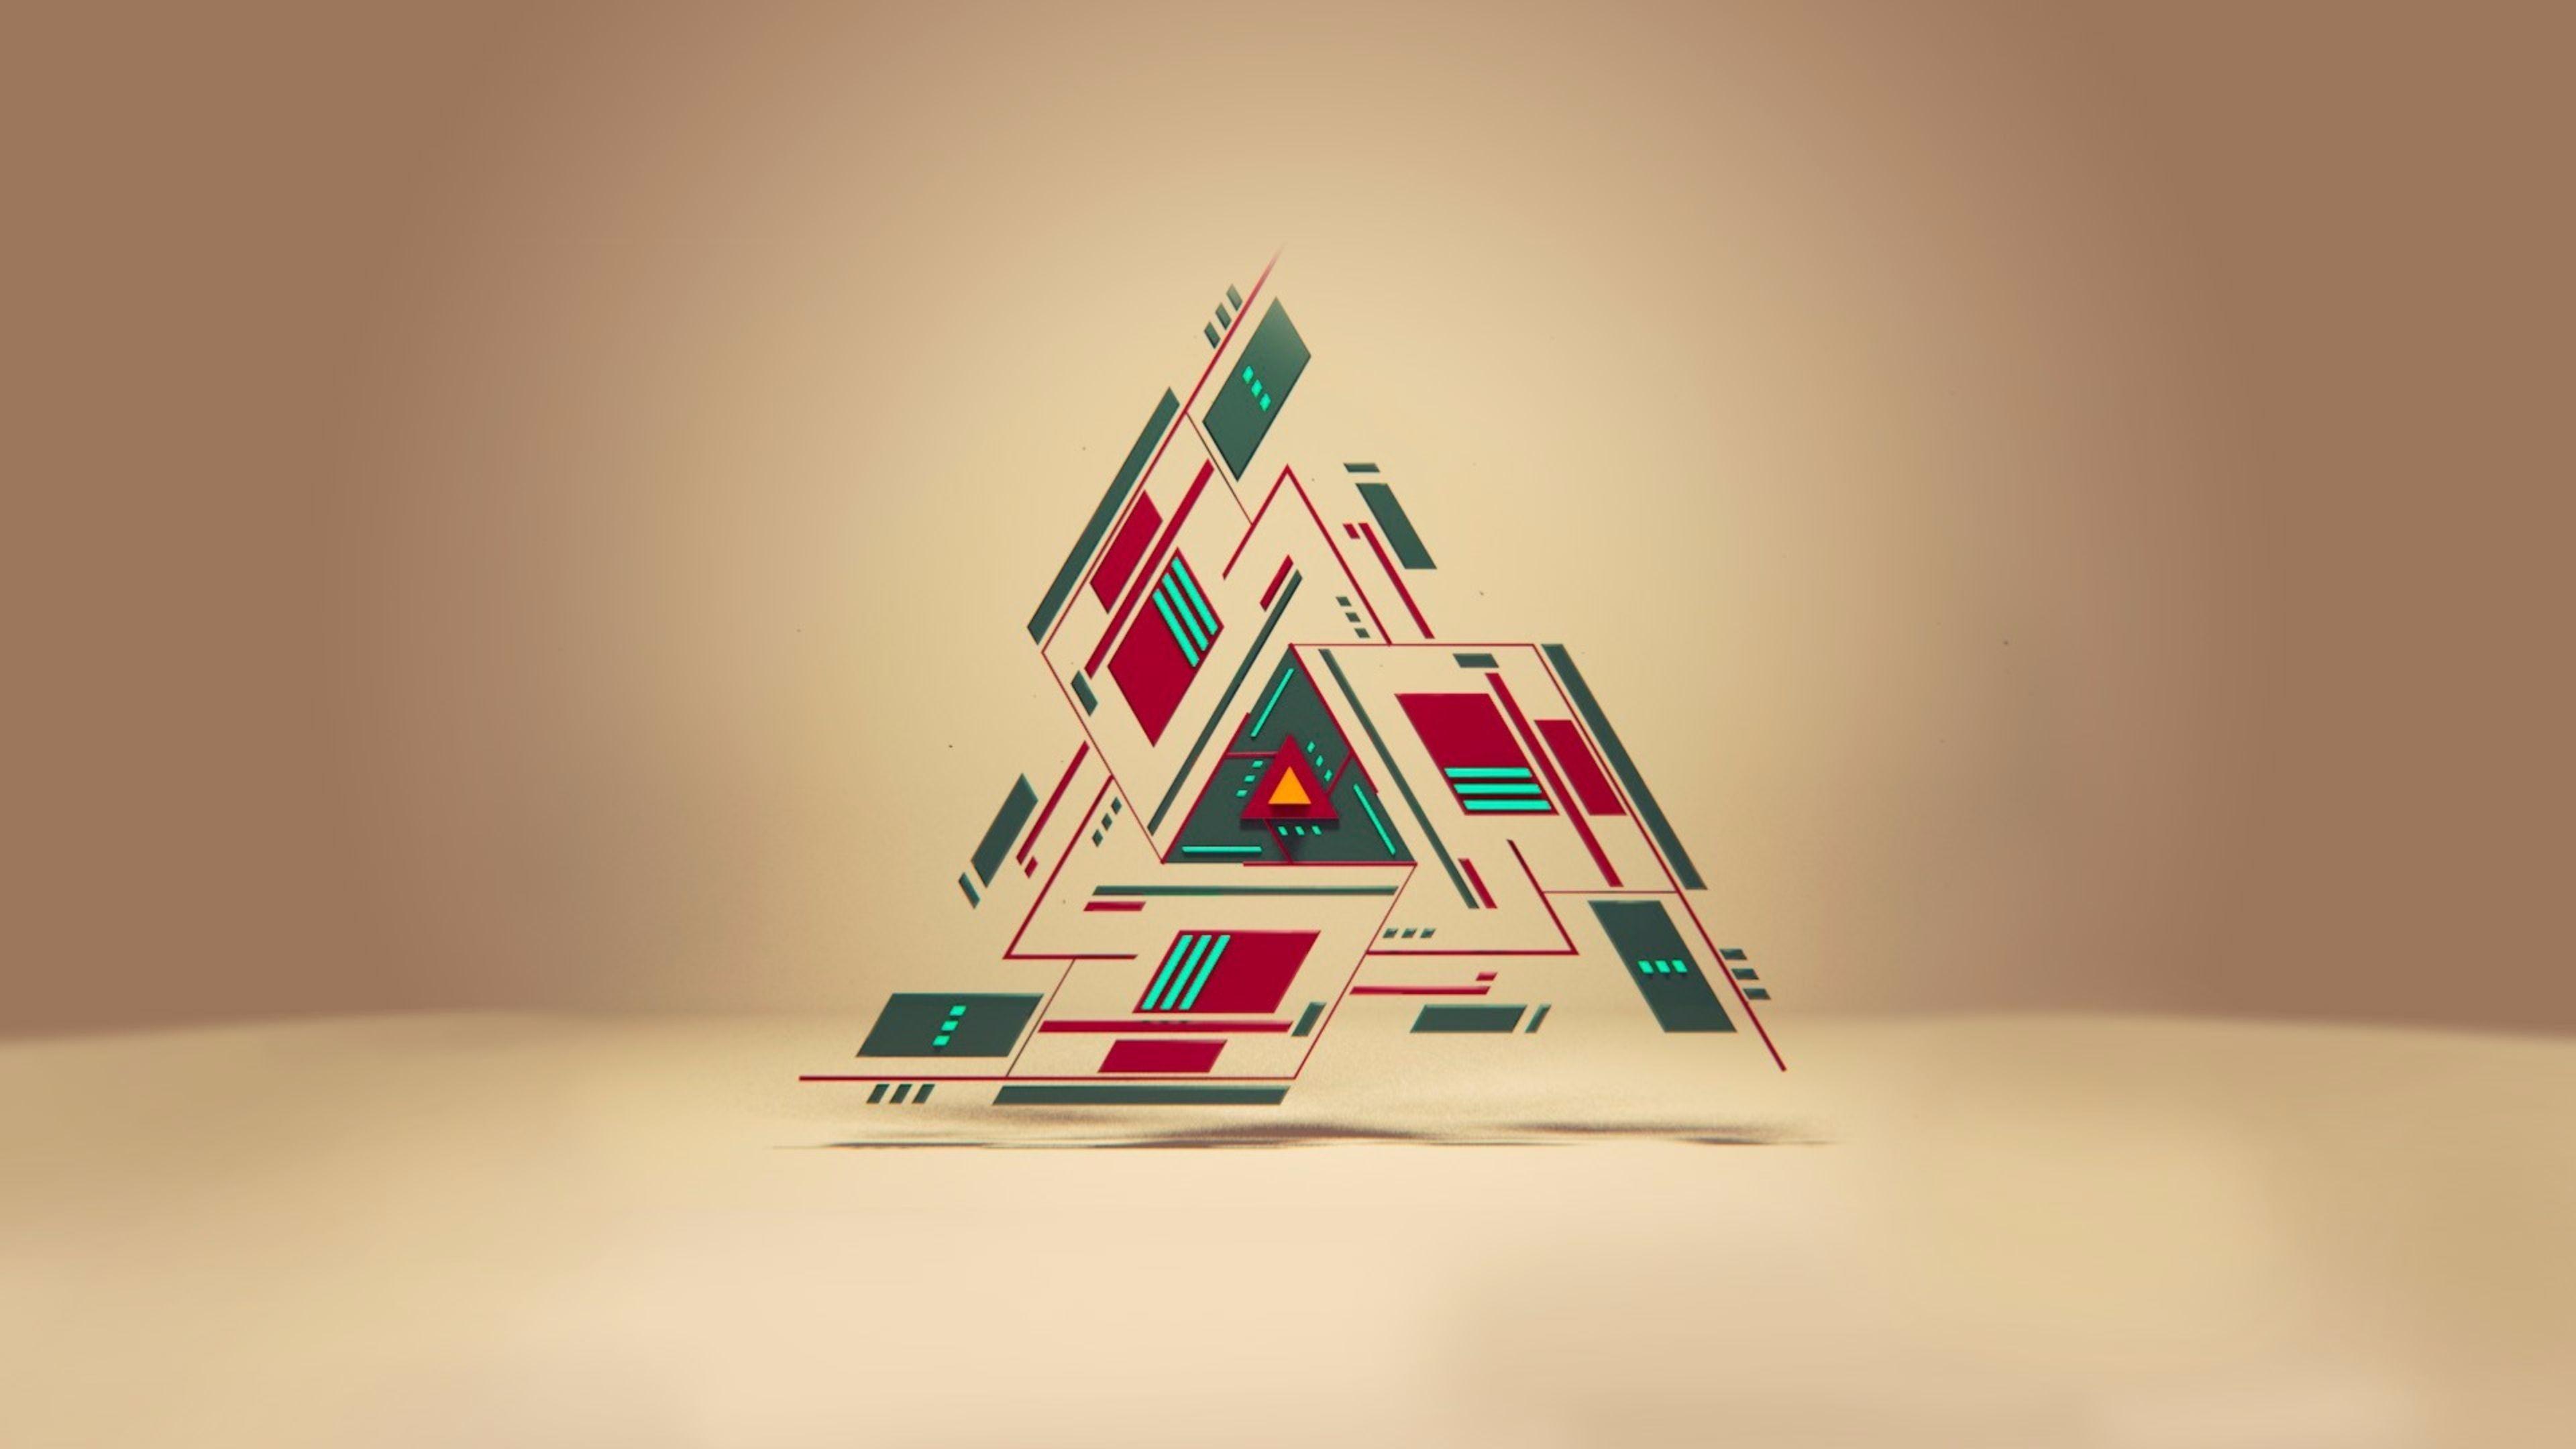 Ultra Hd Abstract Desktop Wallpapers Top Free Ultra Hd